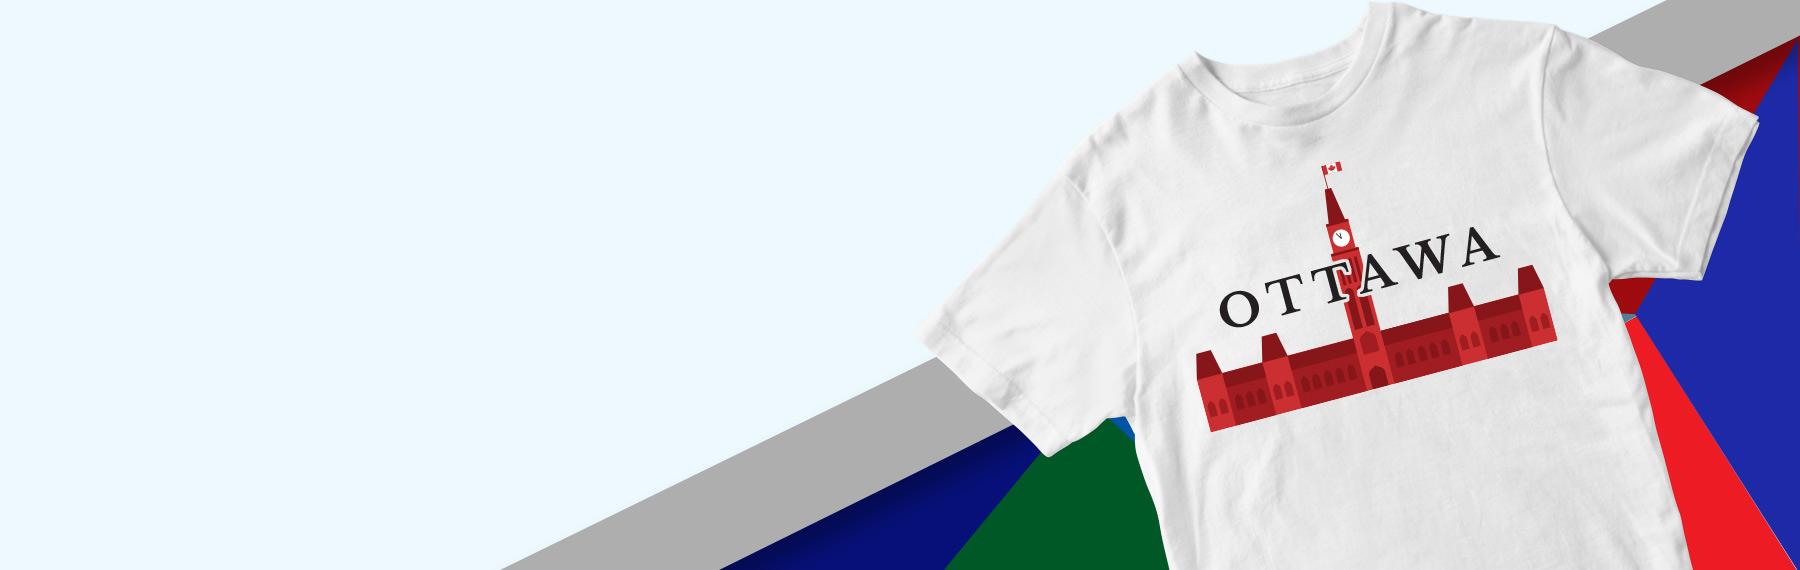 5d8b15230ed161 Design and Order Custom T-Shirts in Ottawa